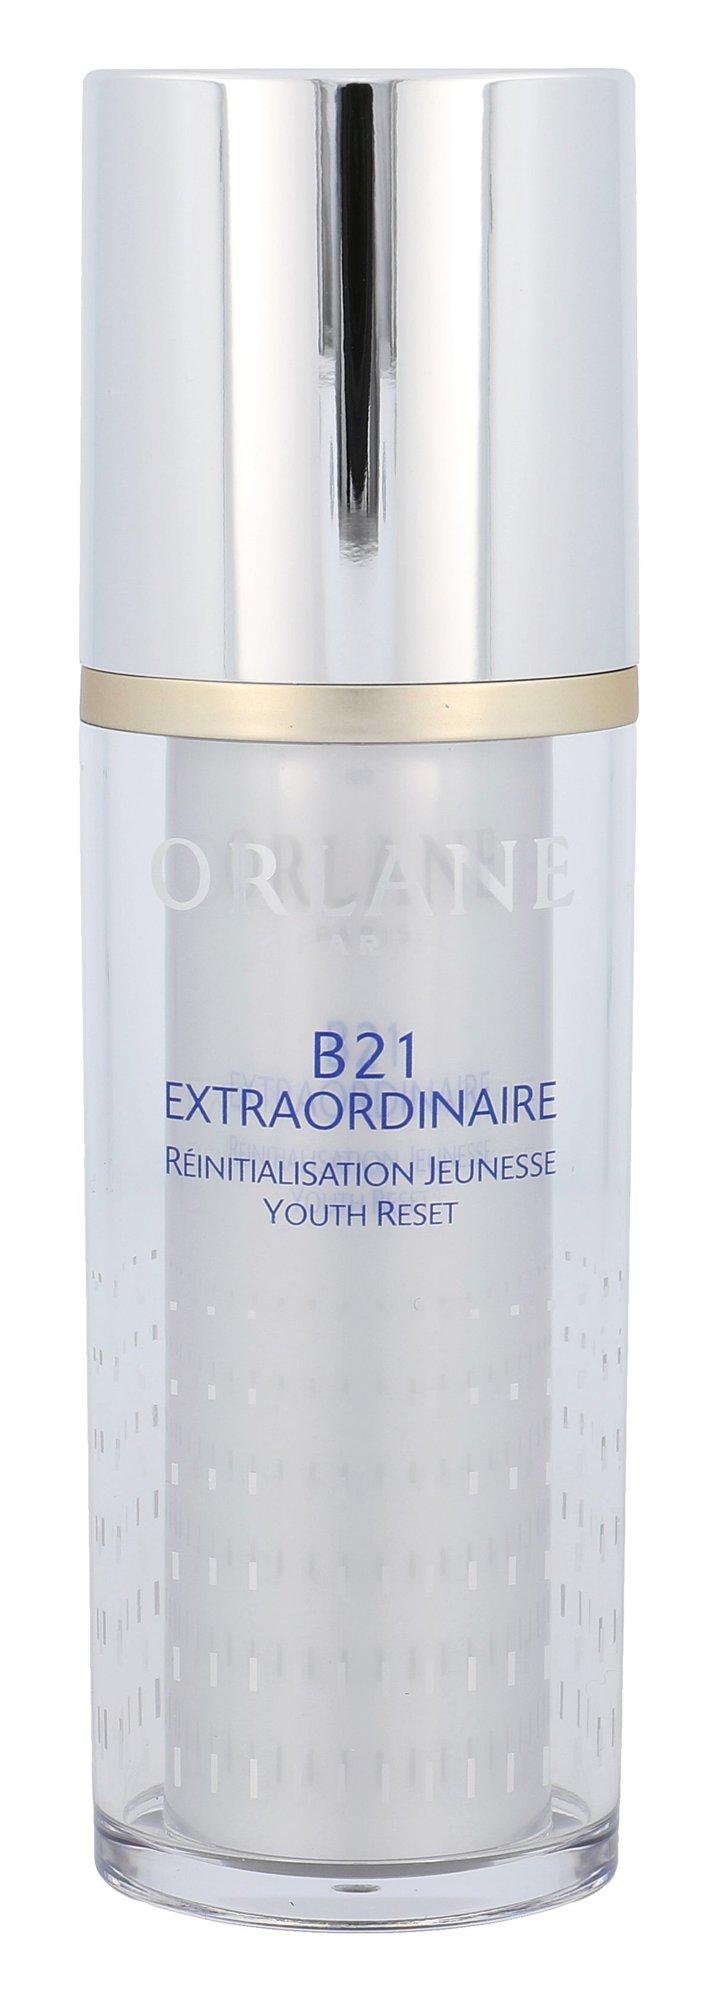 Orlane B21 Extraordinaire Cosmetic 30ml